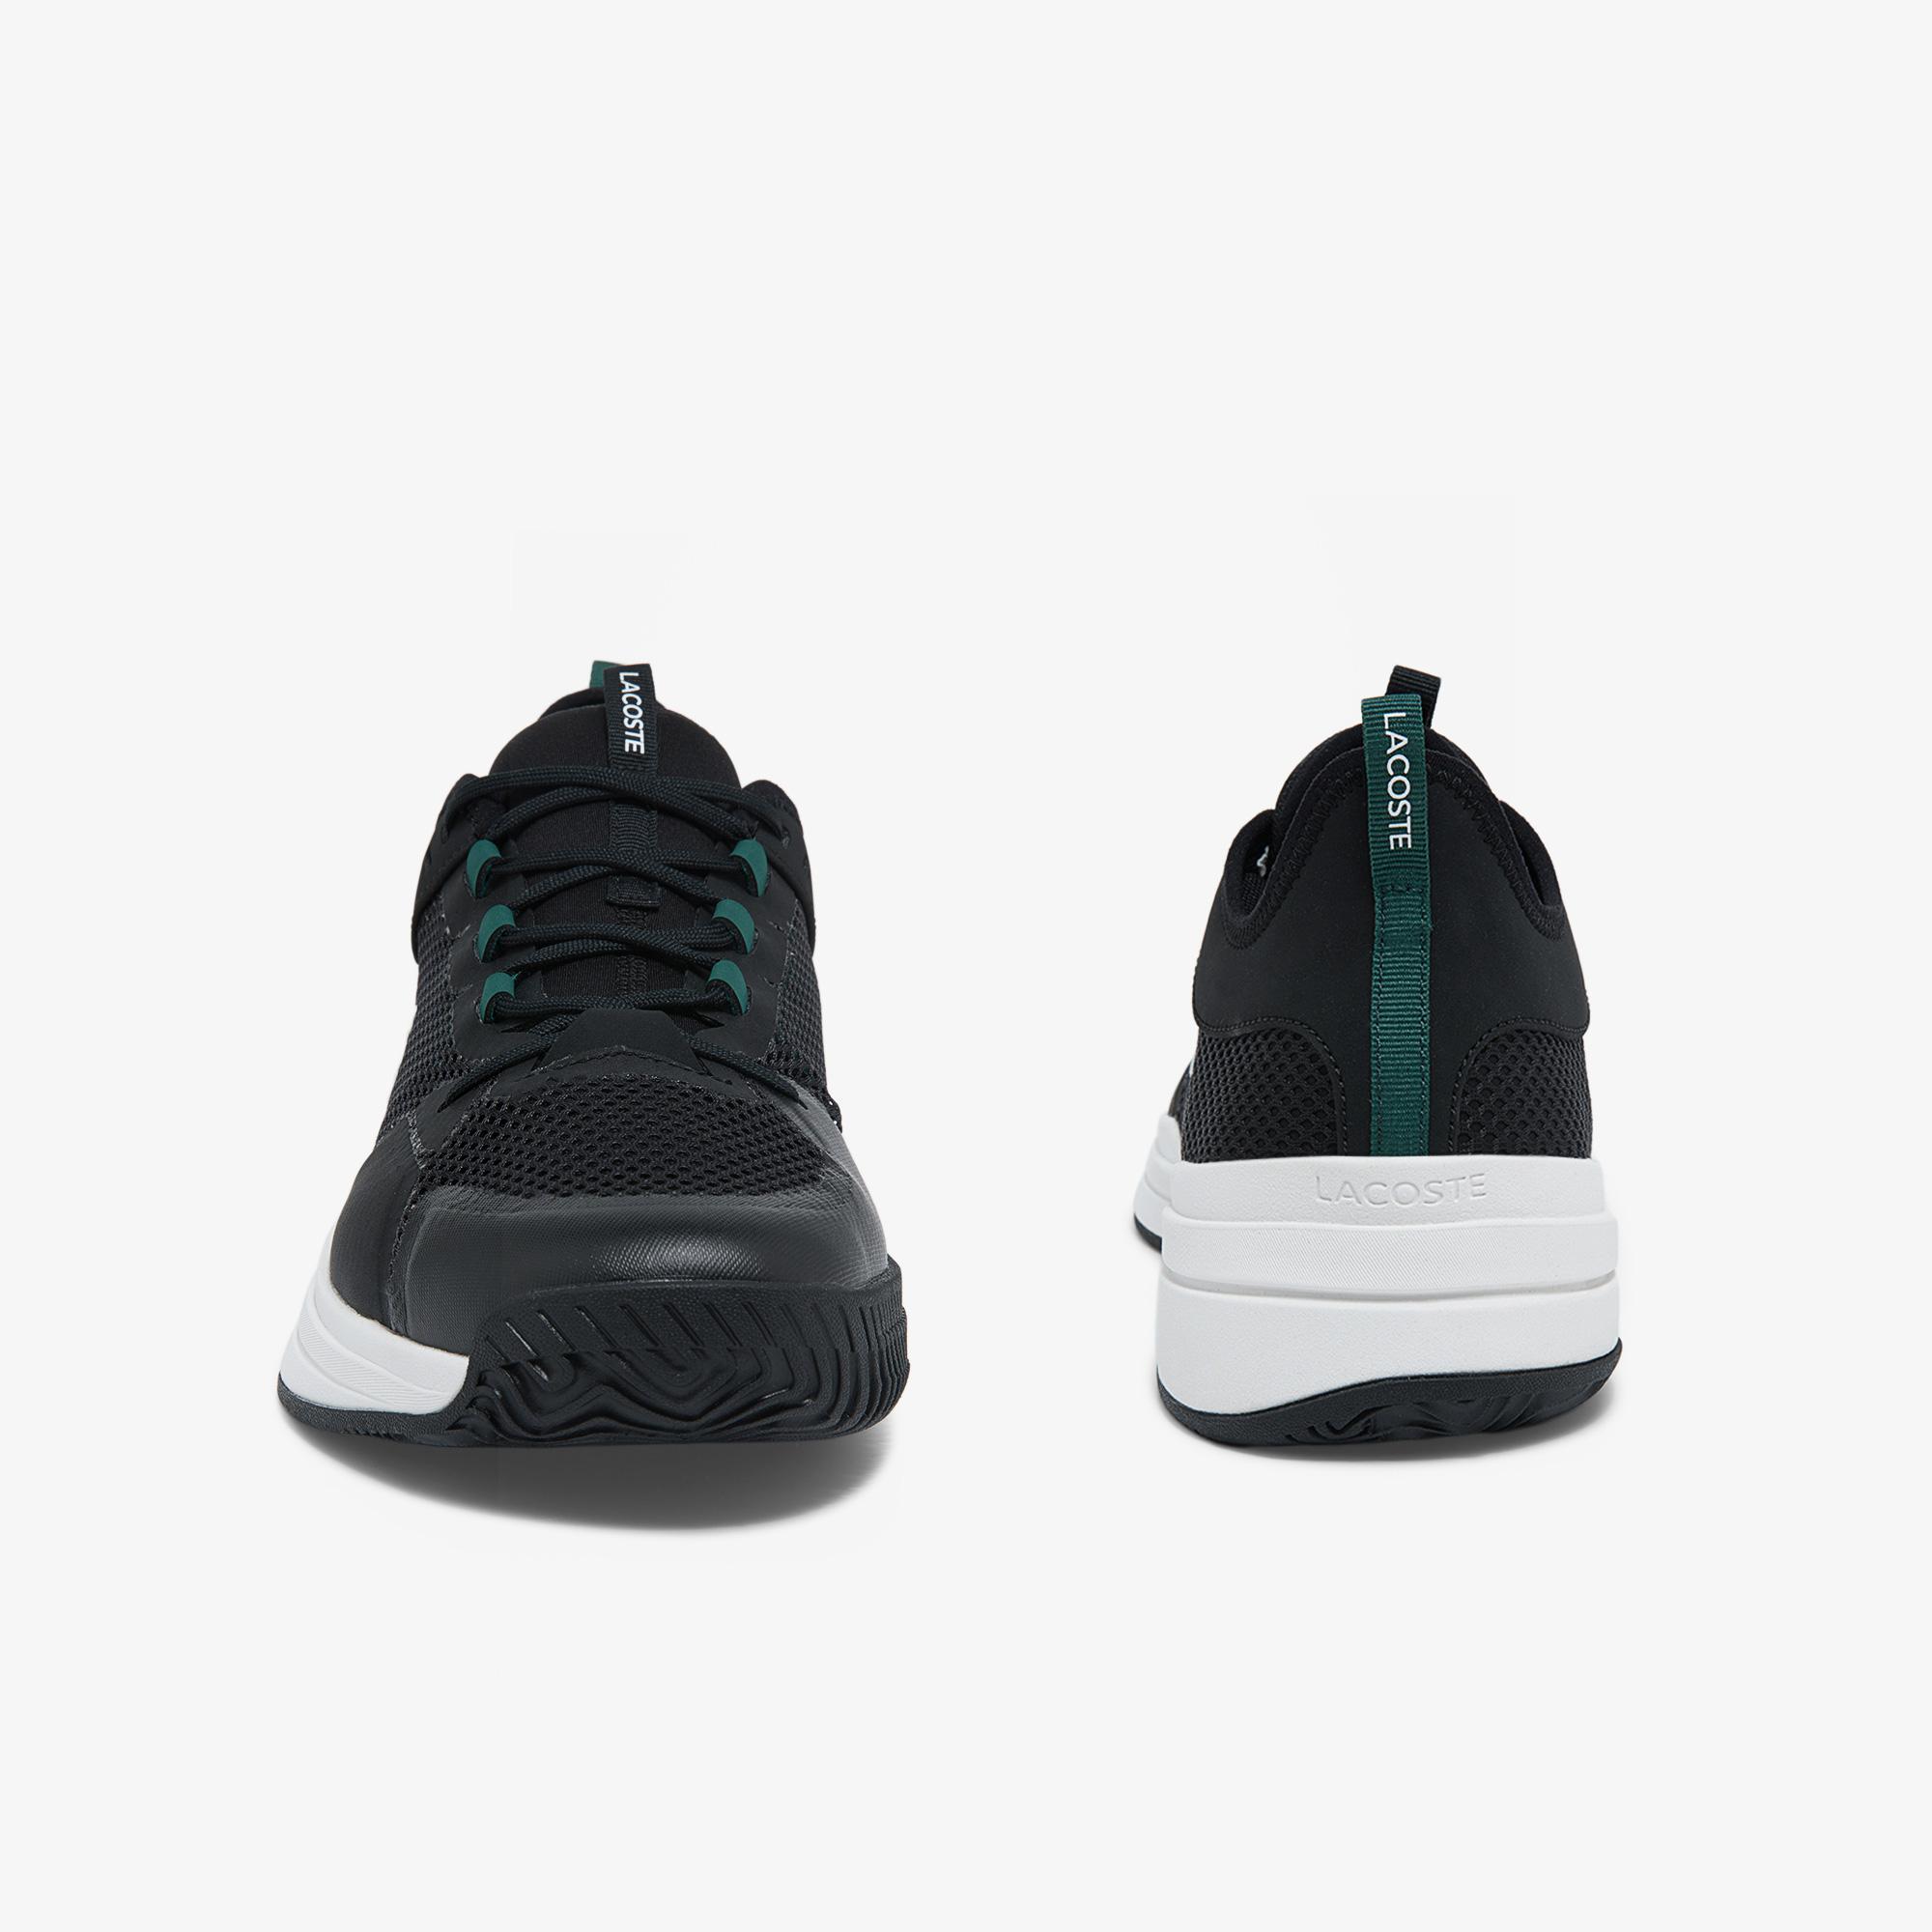 Lacoste Ag-Lt 21 0121 1 Sma Erkek Siyah - Yeşil Sneaker